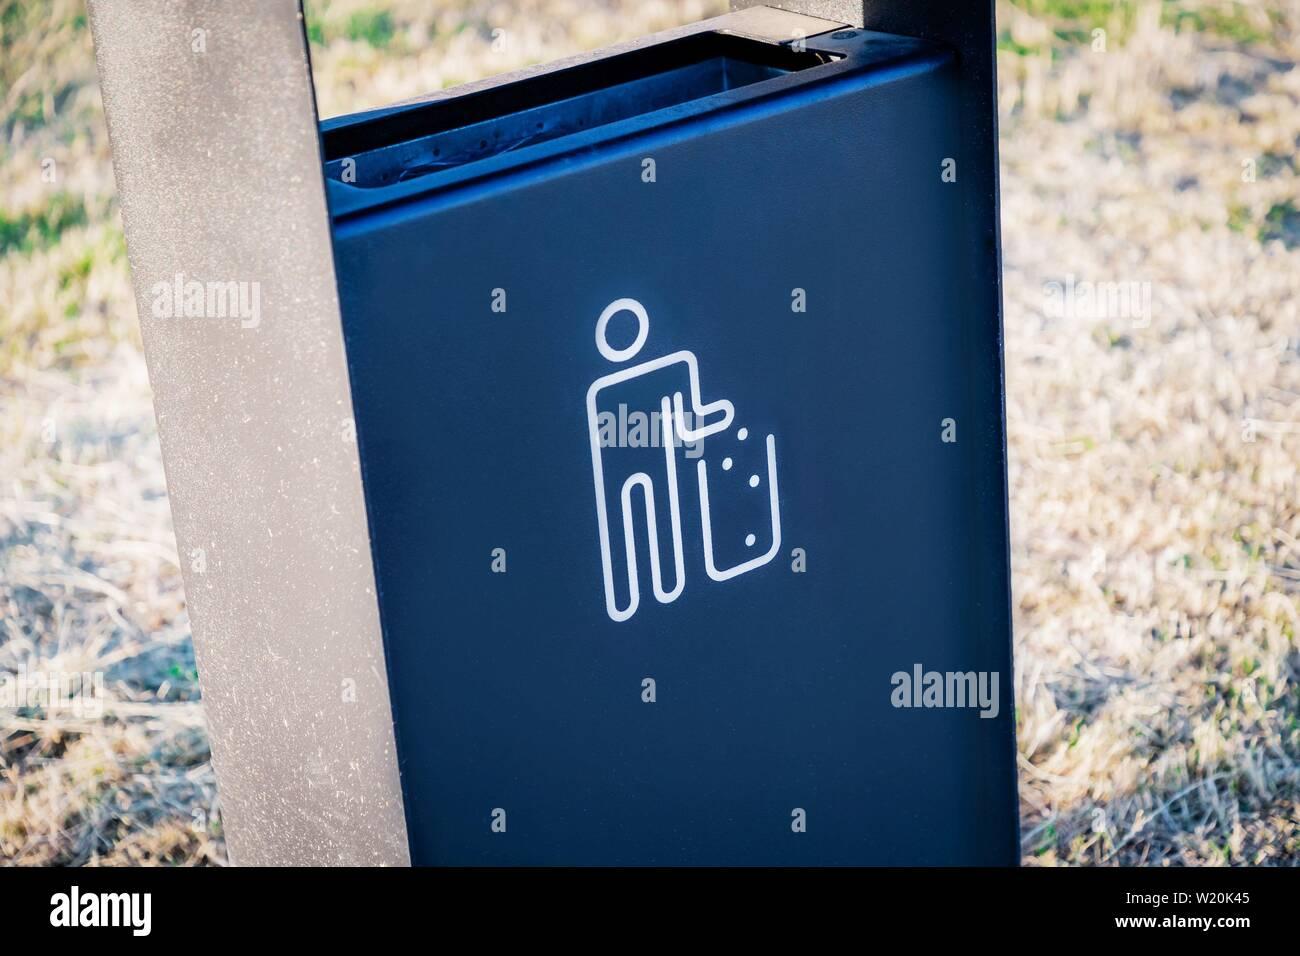 Black metal garbage bin or trash can with tidy man symbol outdoor - Stock Image